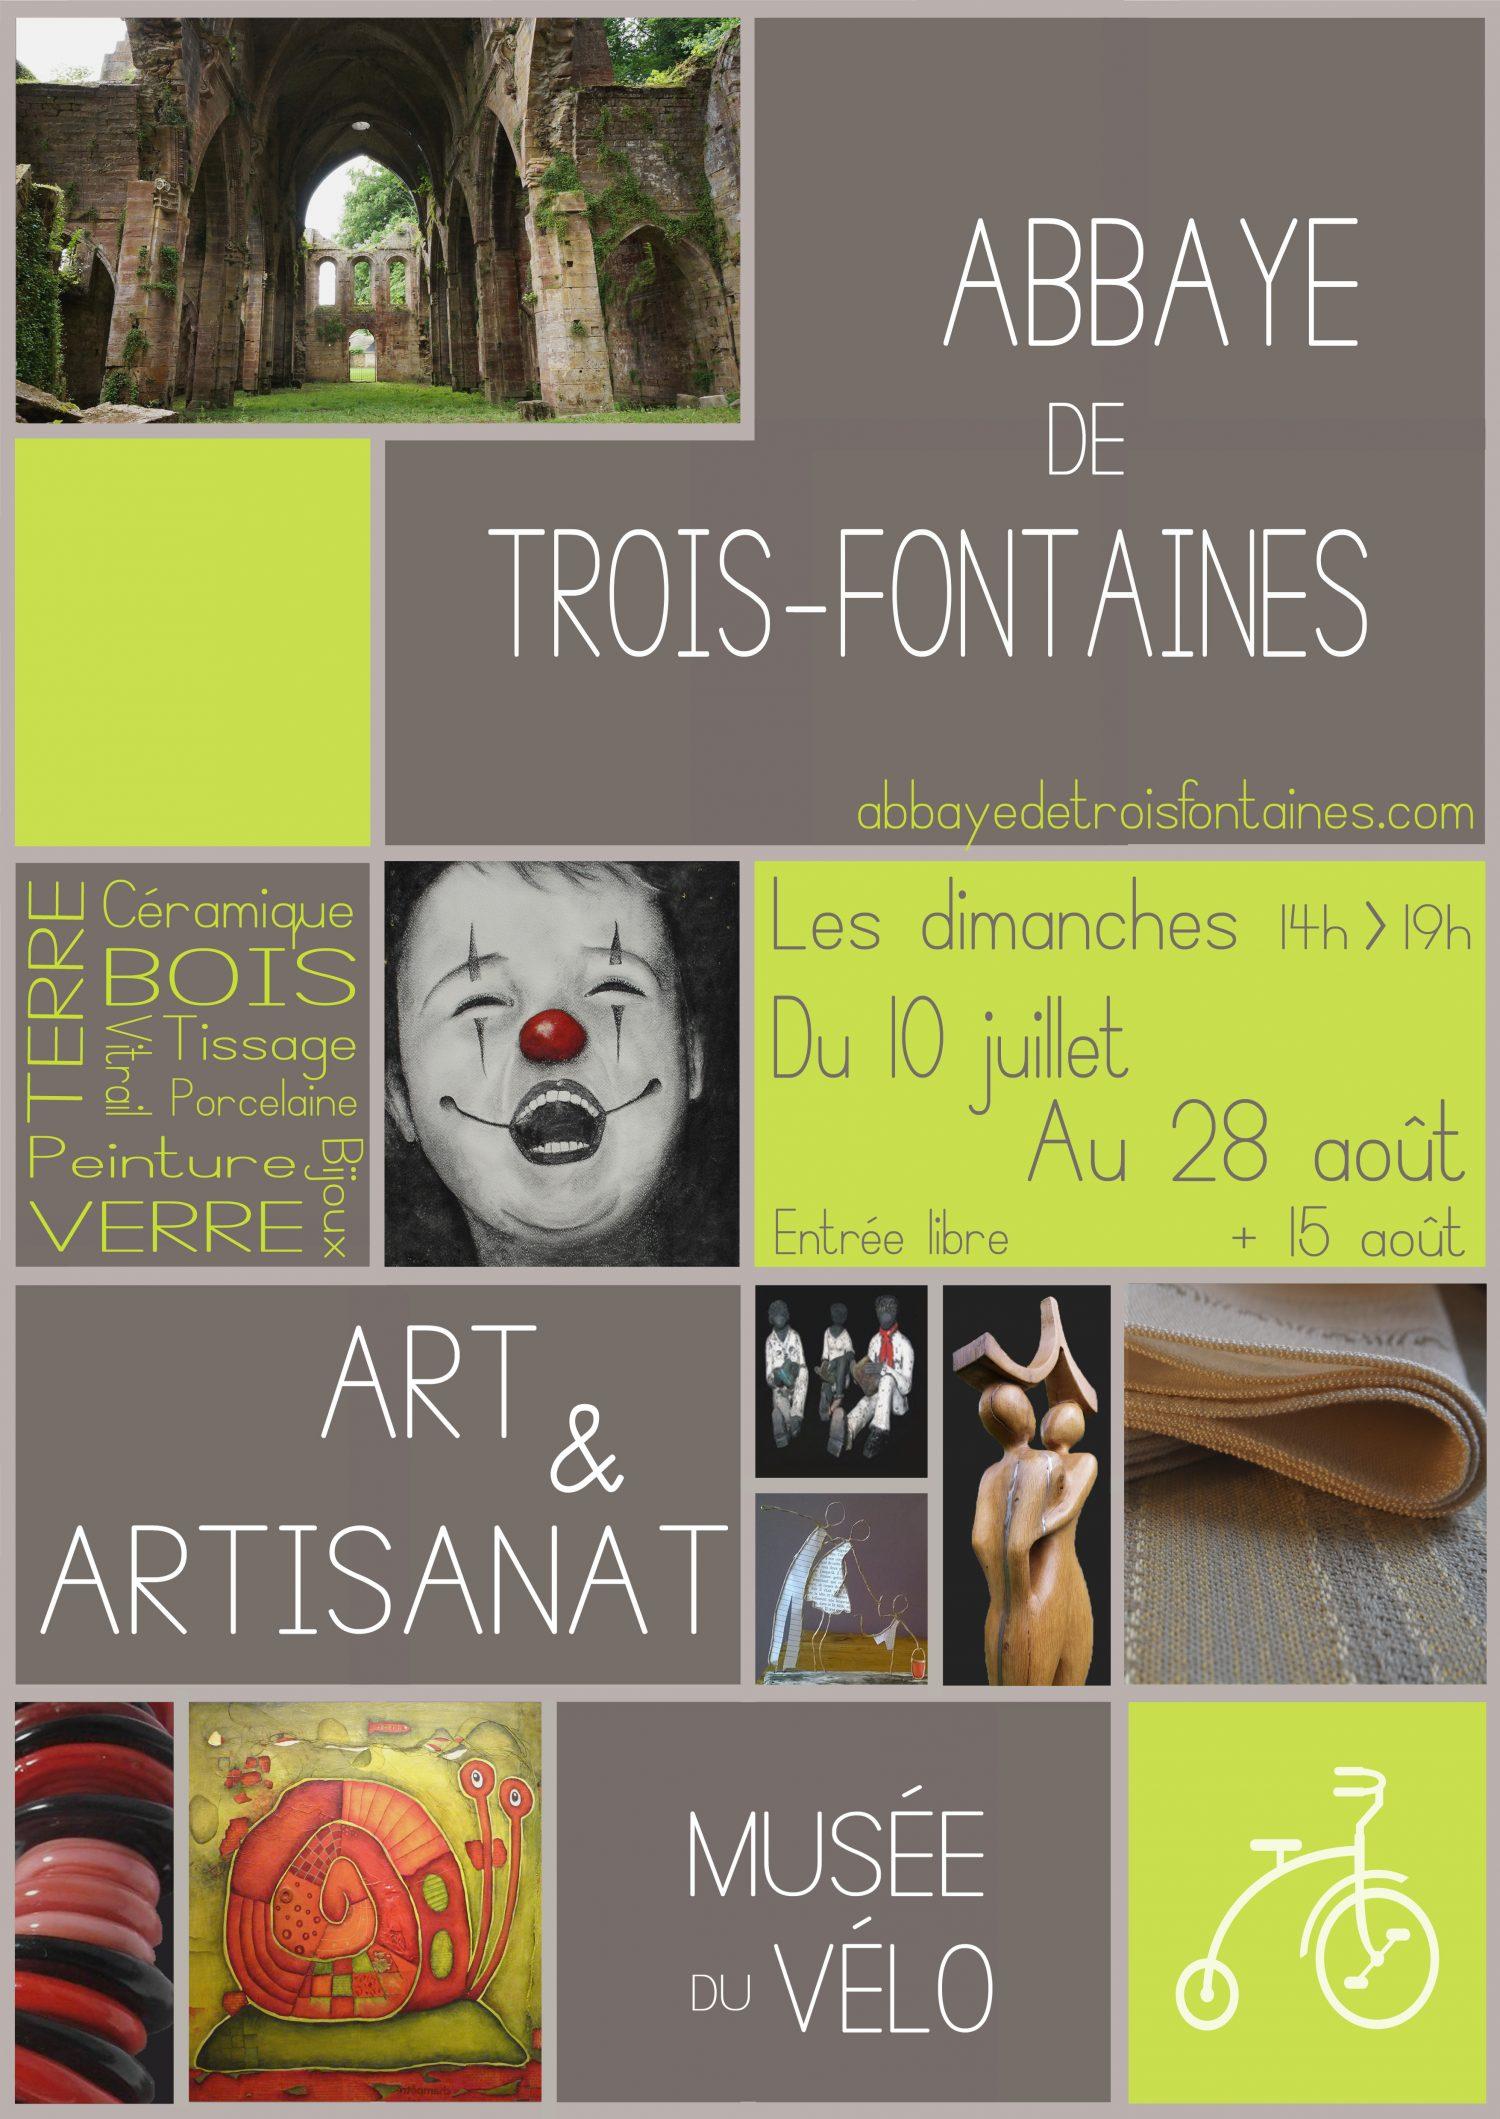 abbaye 3 affiche